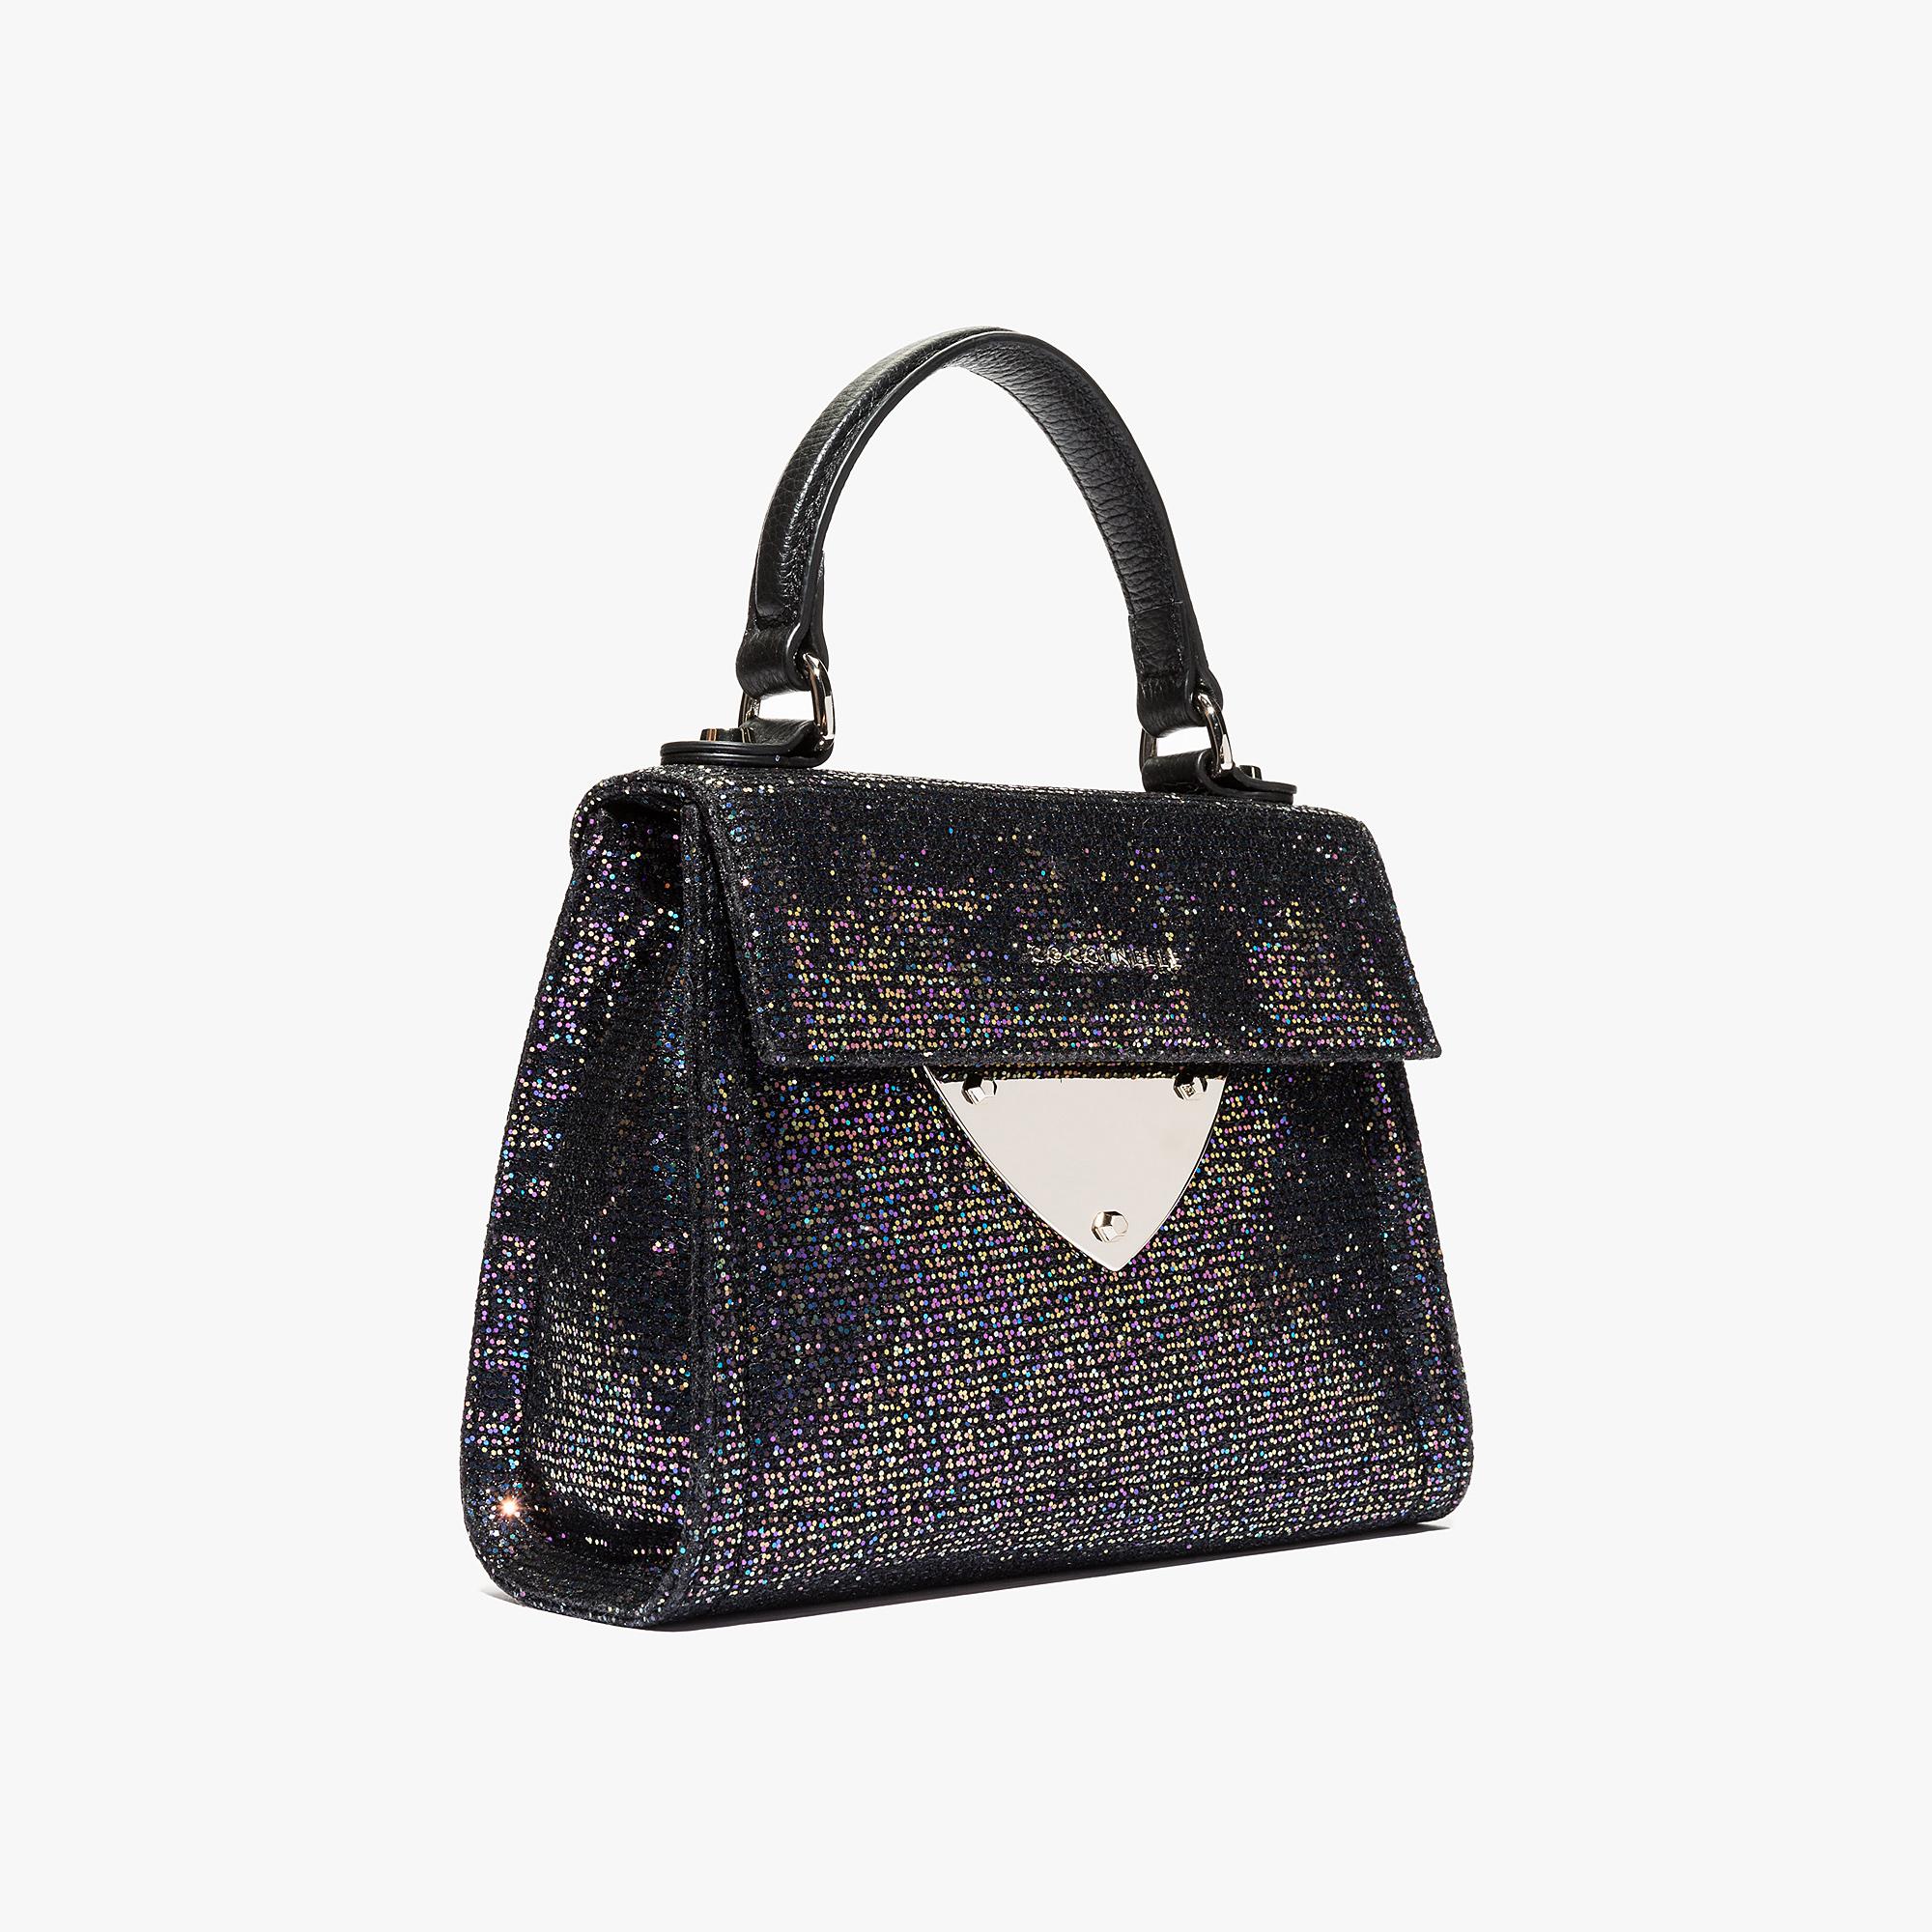 B14 mini bag in glittery leather